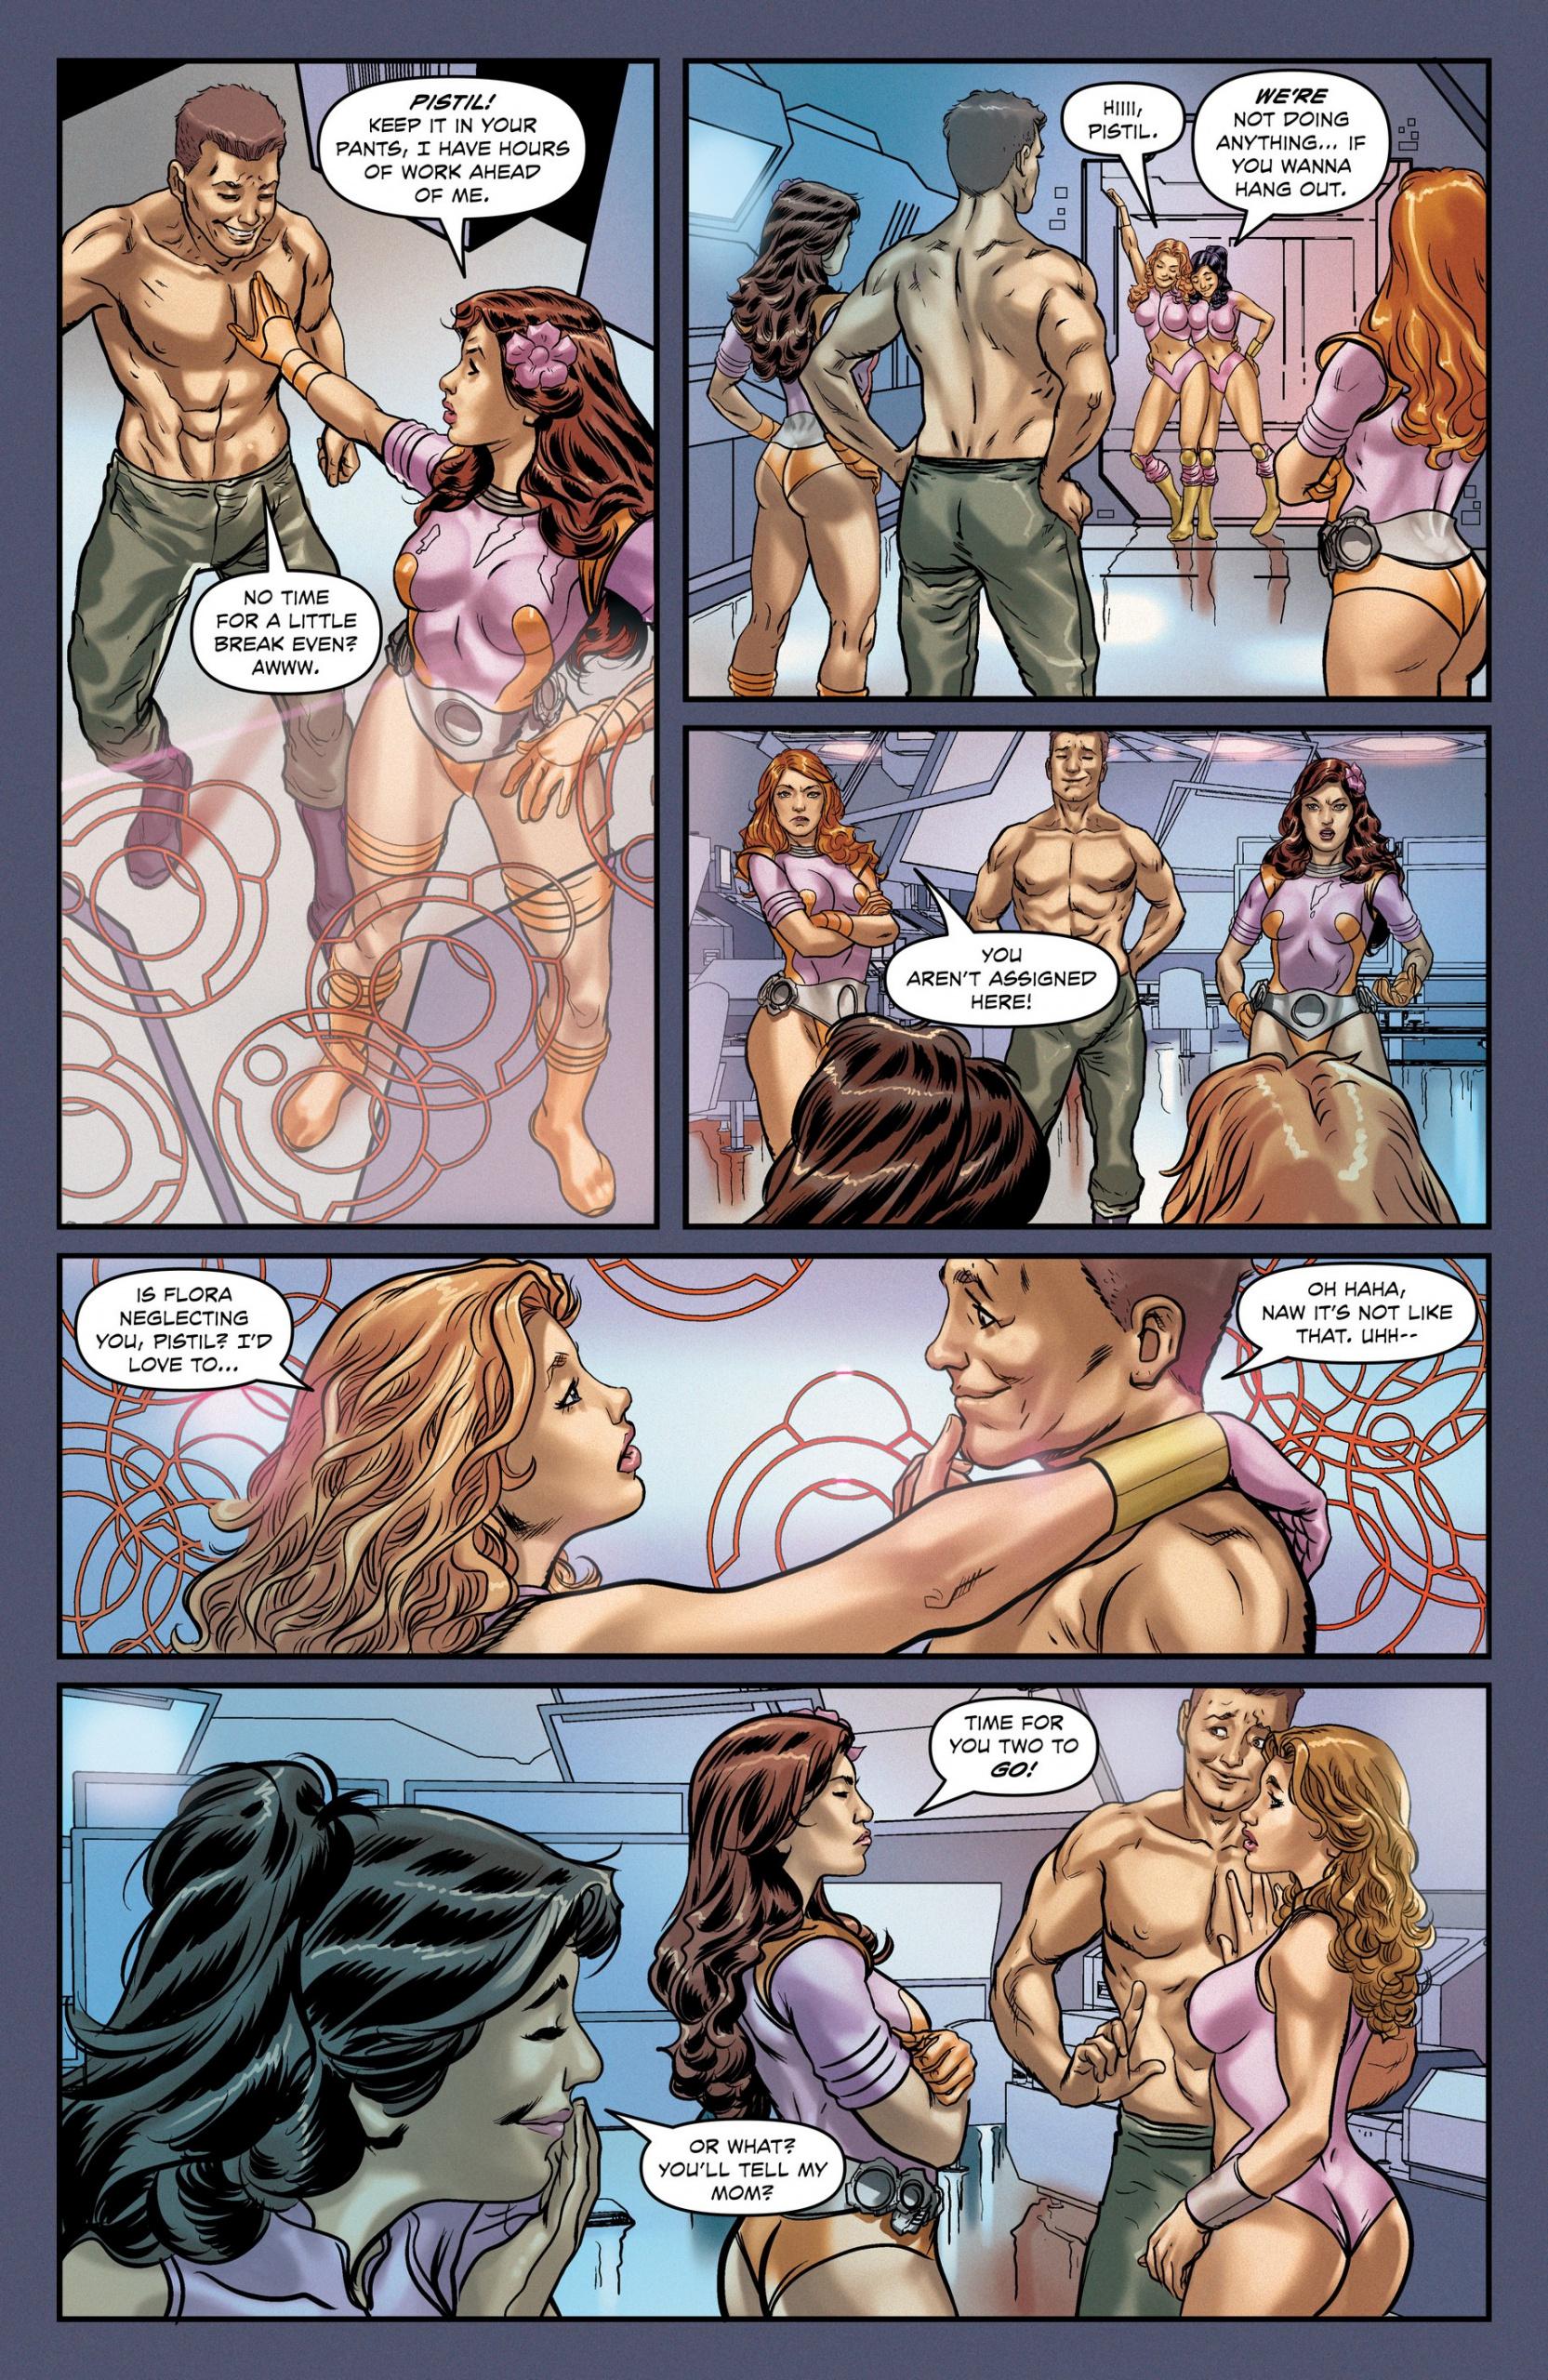 Jungle Fantasy - Secrets #0 porn comics Masturbation, Group Sex, Lesbians, Rape, Sex Toys, Stockings